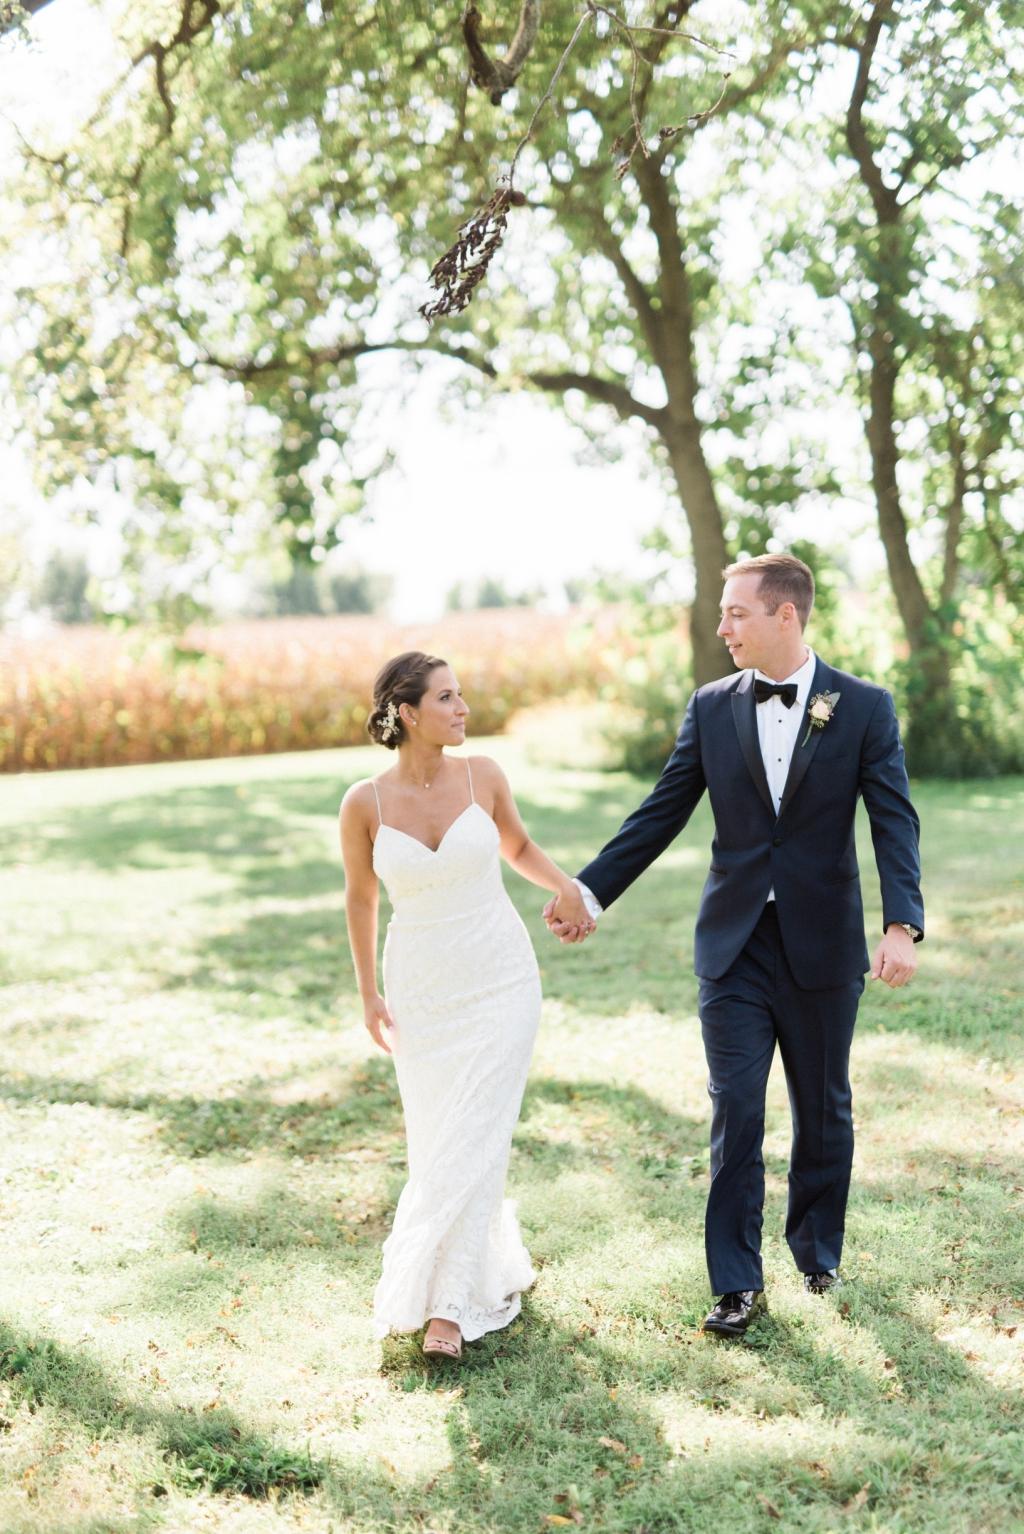 haley-richter-photography-buena-vista-confrence-center-wedding-summer-077